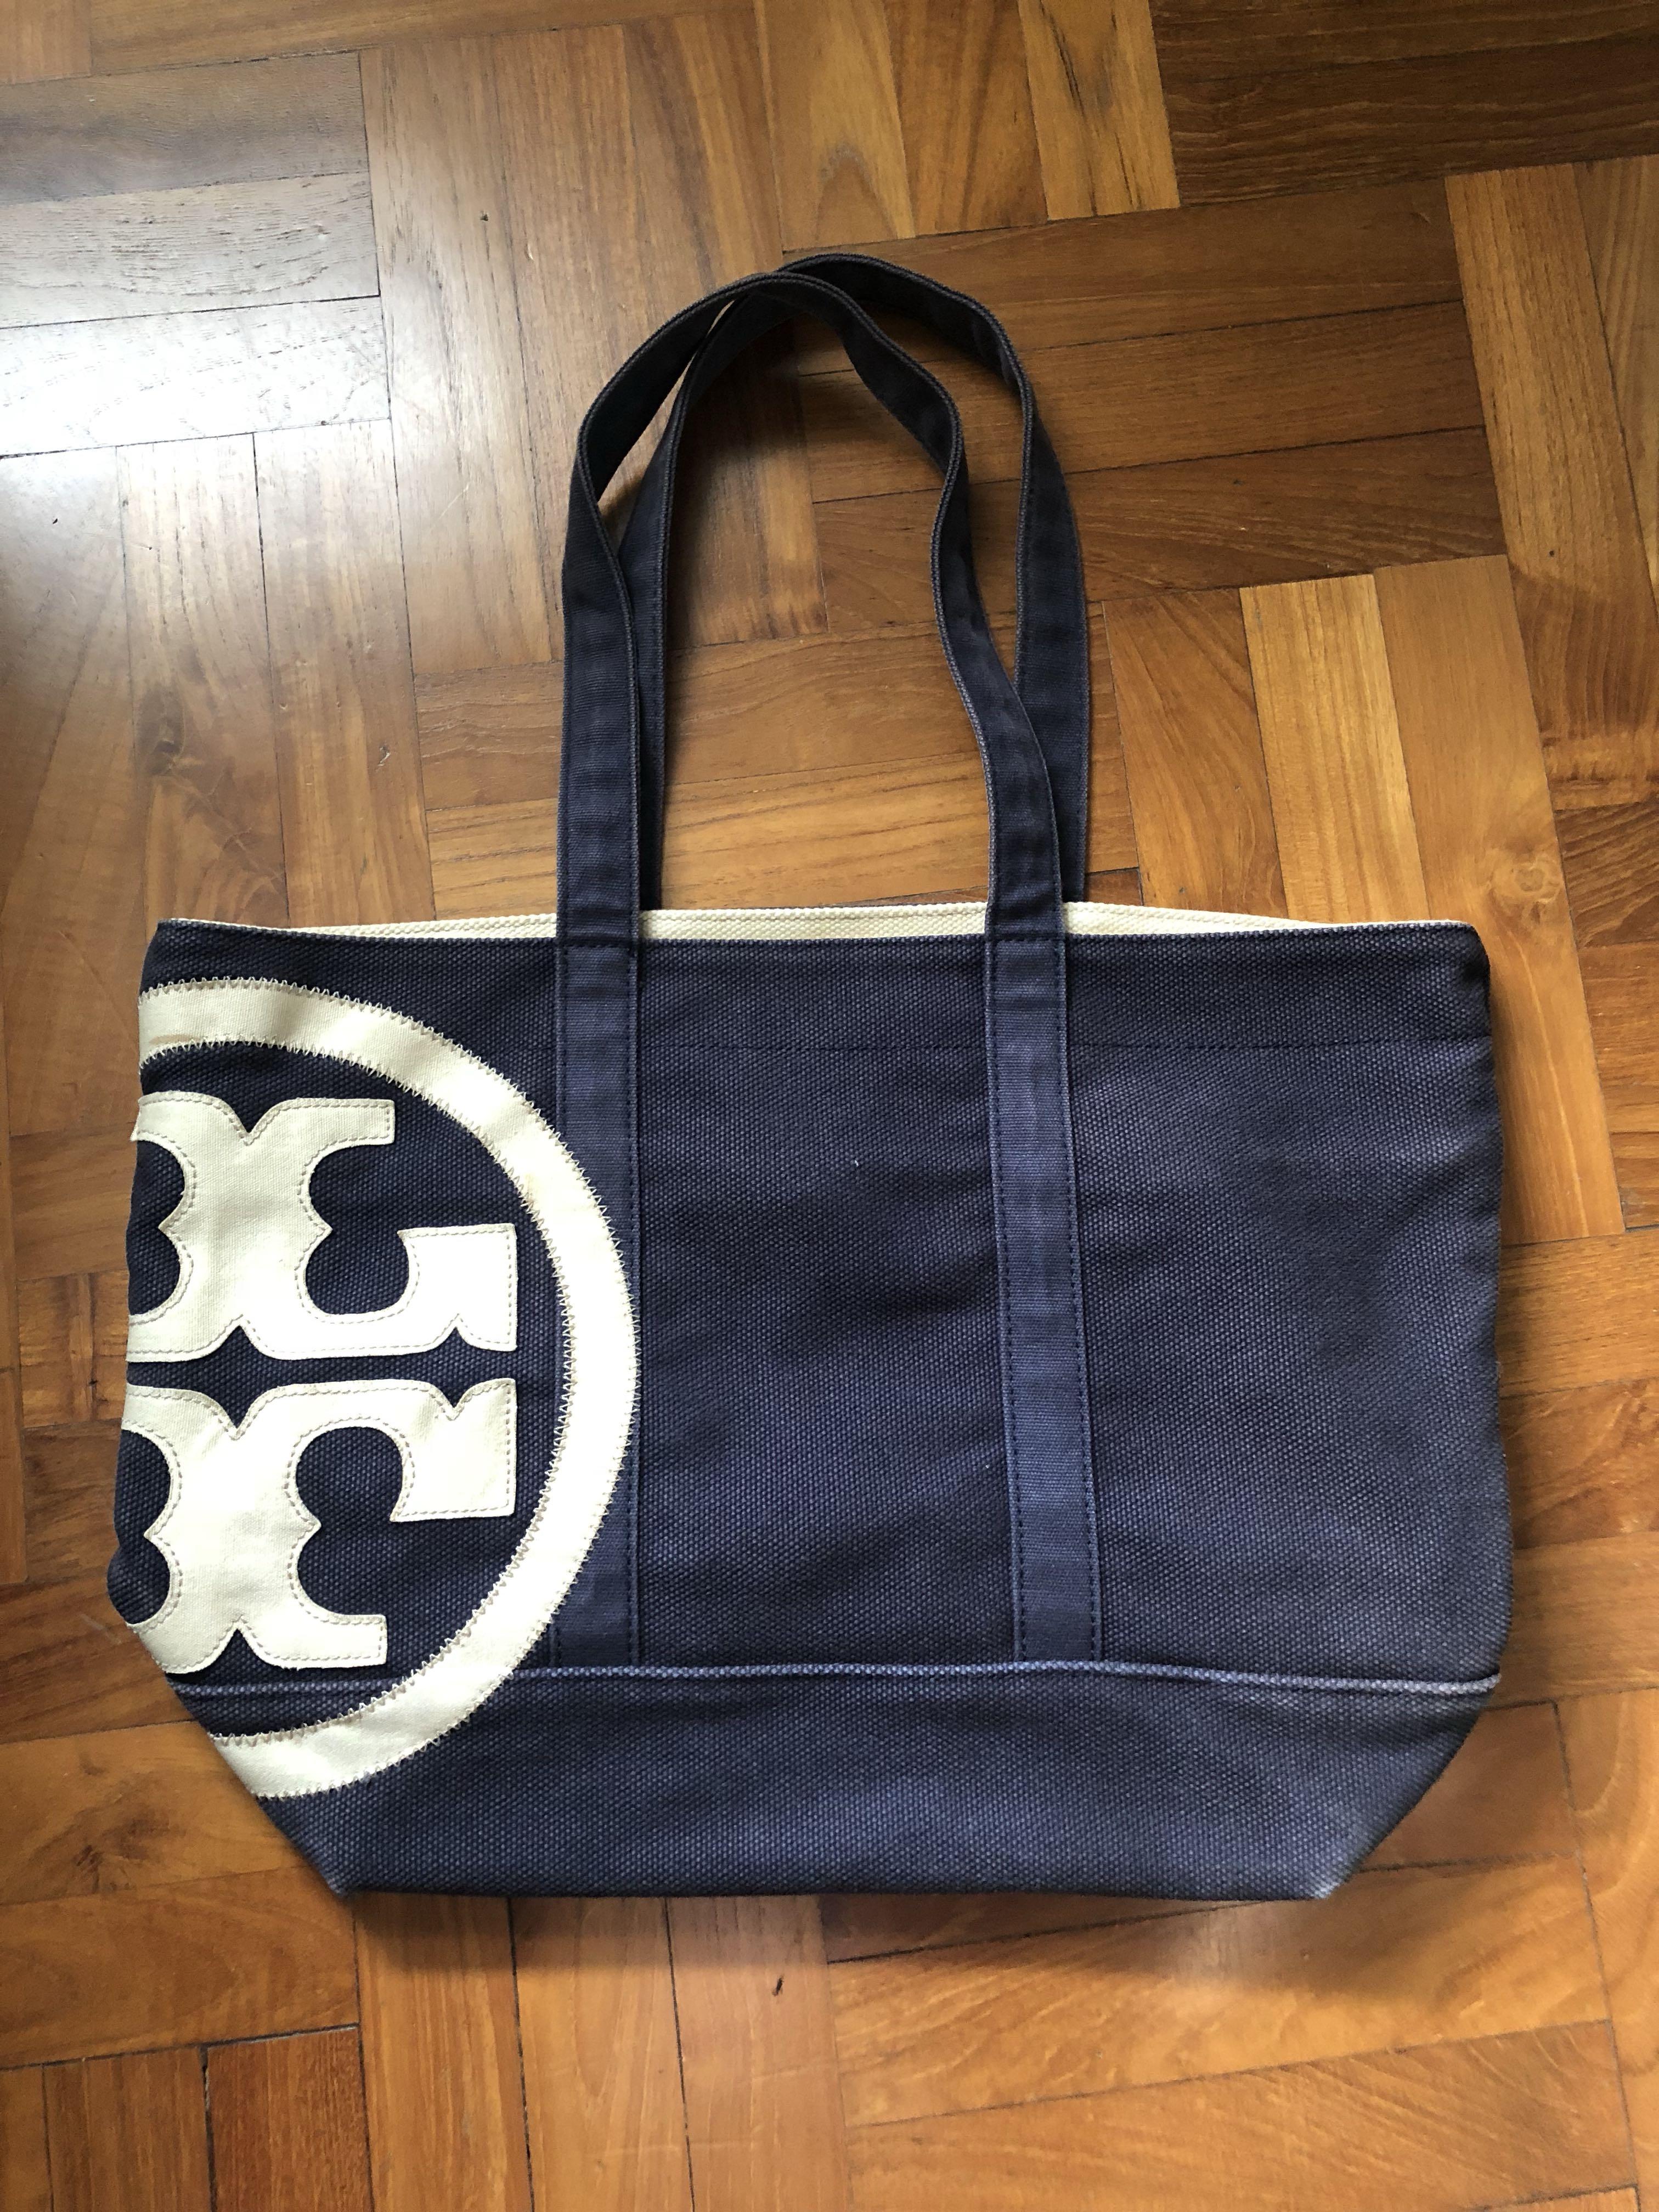 d842e04e865 Tory Burch Logo Canvas shoulder bag, Women's Fashion, Bags & Wallets ...